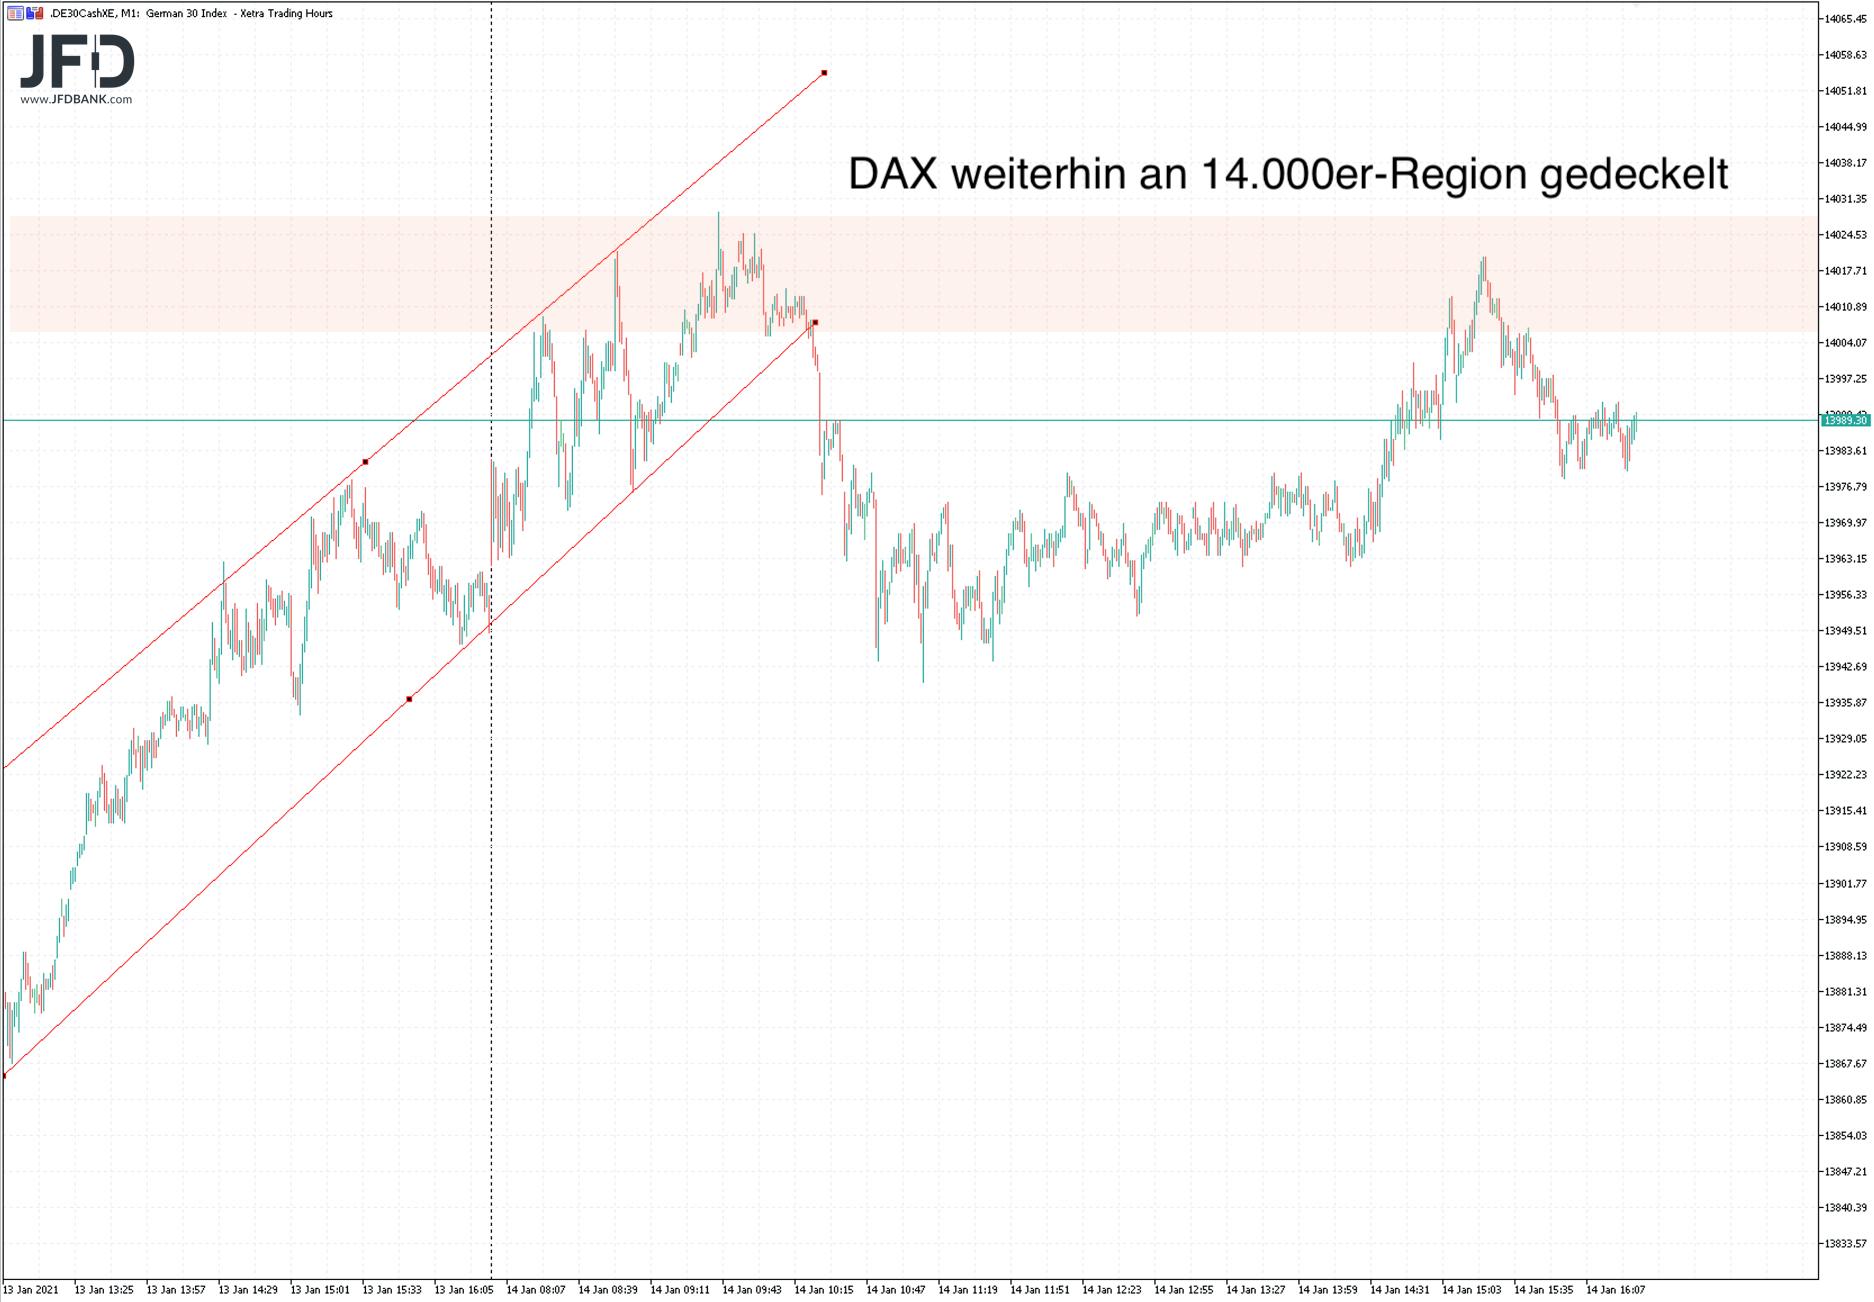 DAX-Fortsetzung der Webinar-Grafik